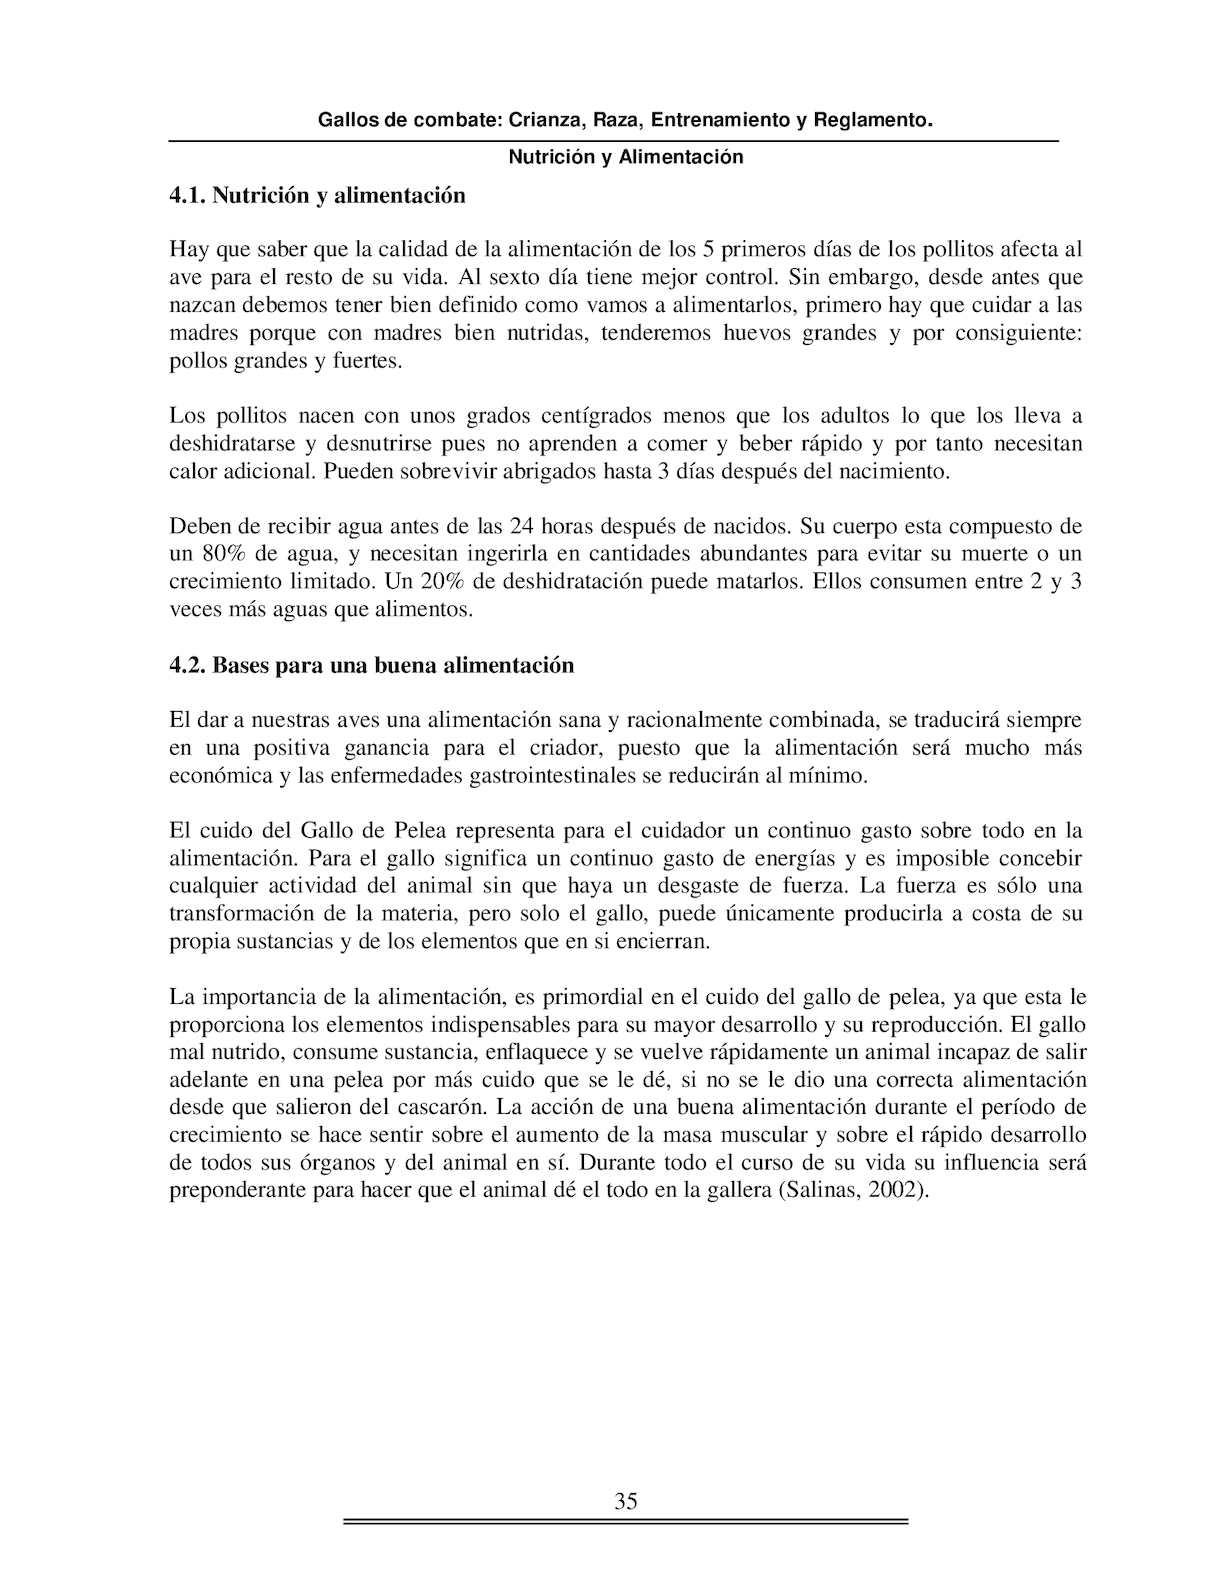 Crianza De Gallos - CALAMEO Downloader